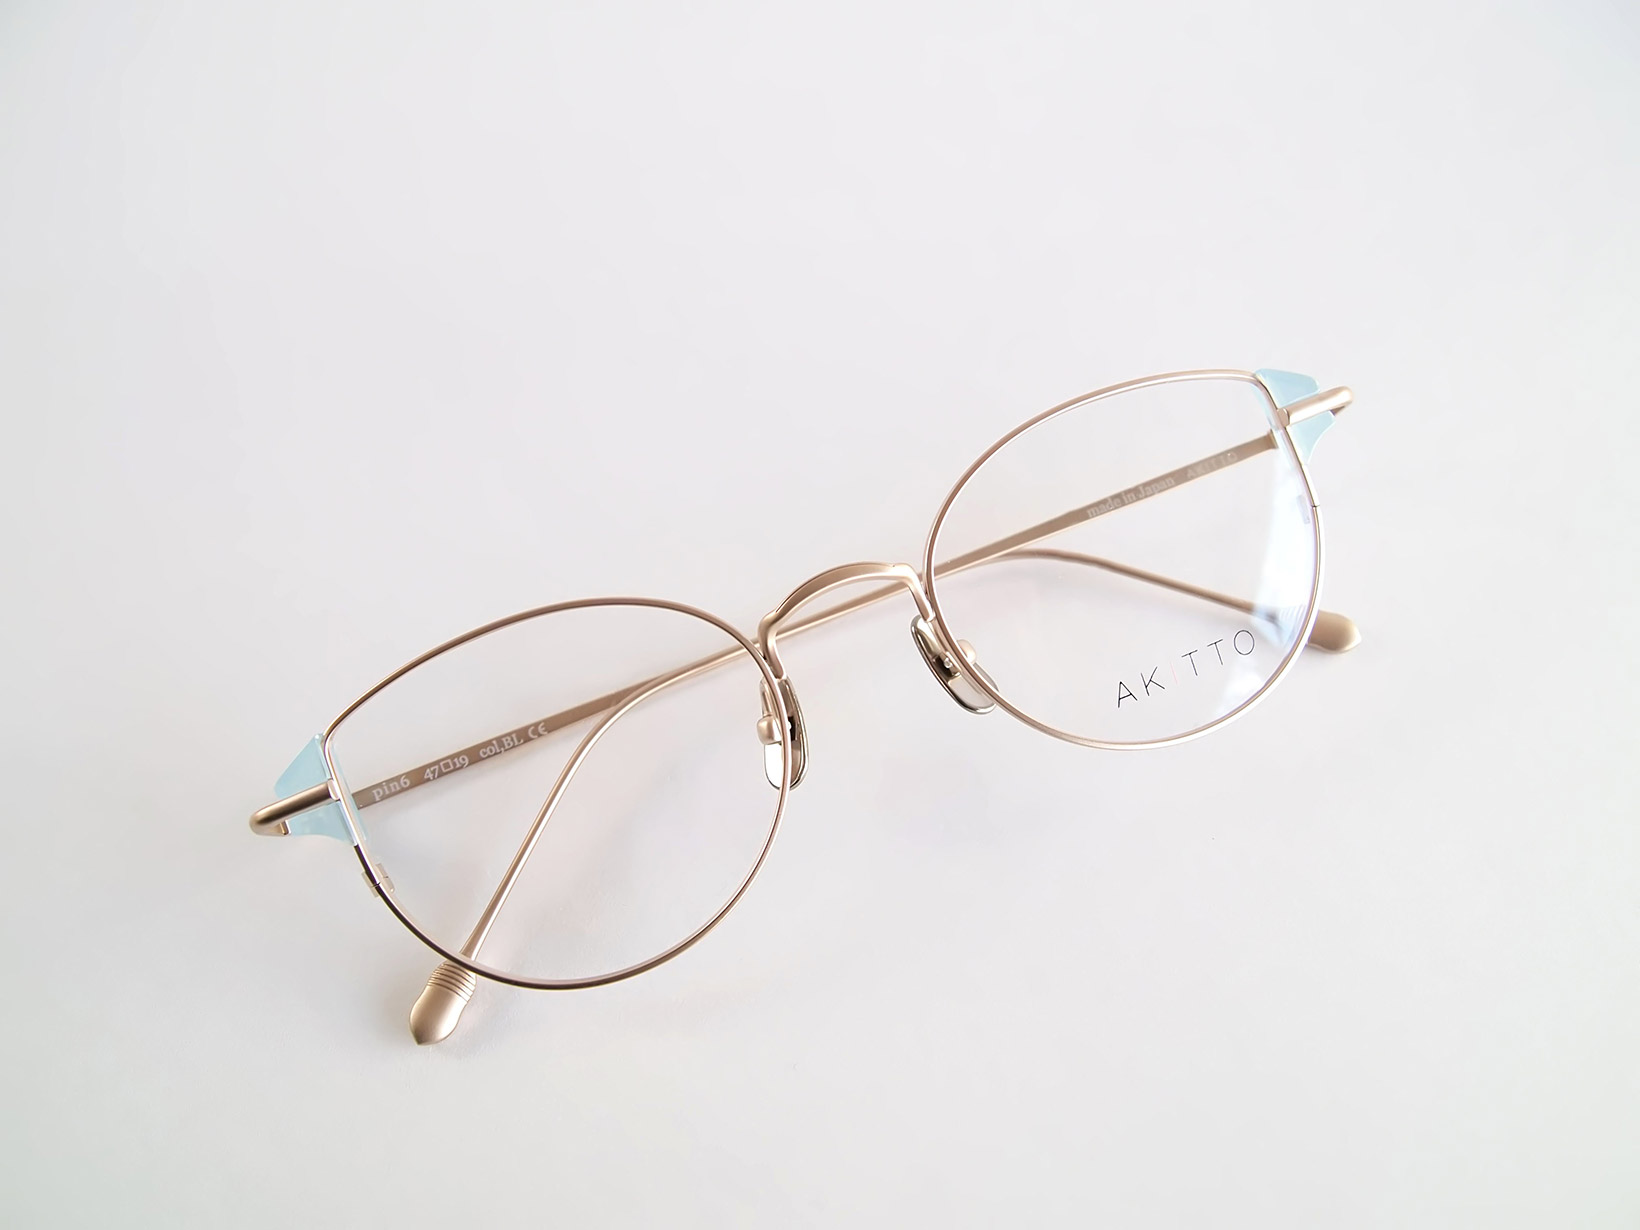 AKITTO 2019-1st pin6 color BL size:47□19 material:titanium+acetate price:¥42,000-(+tax)